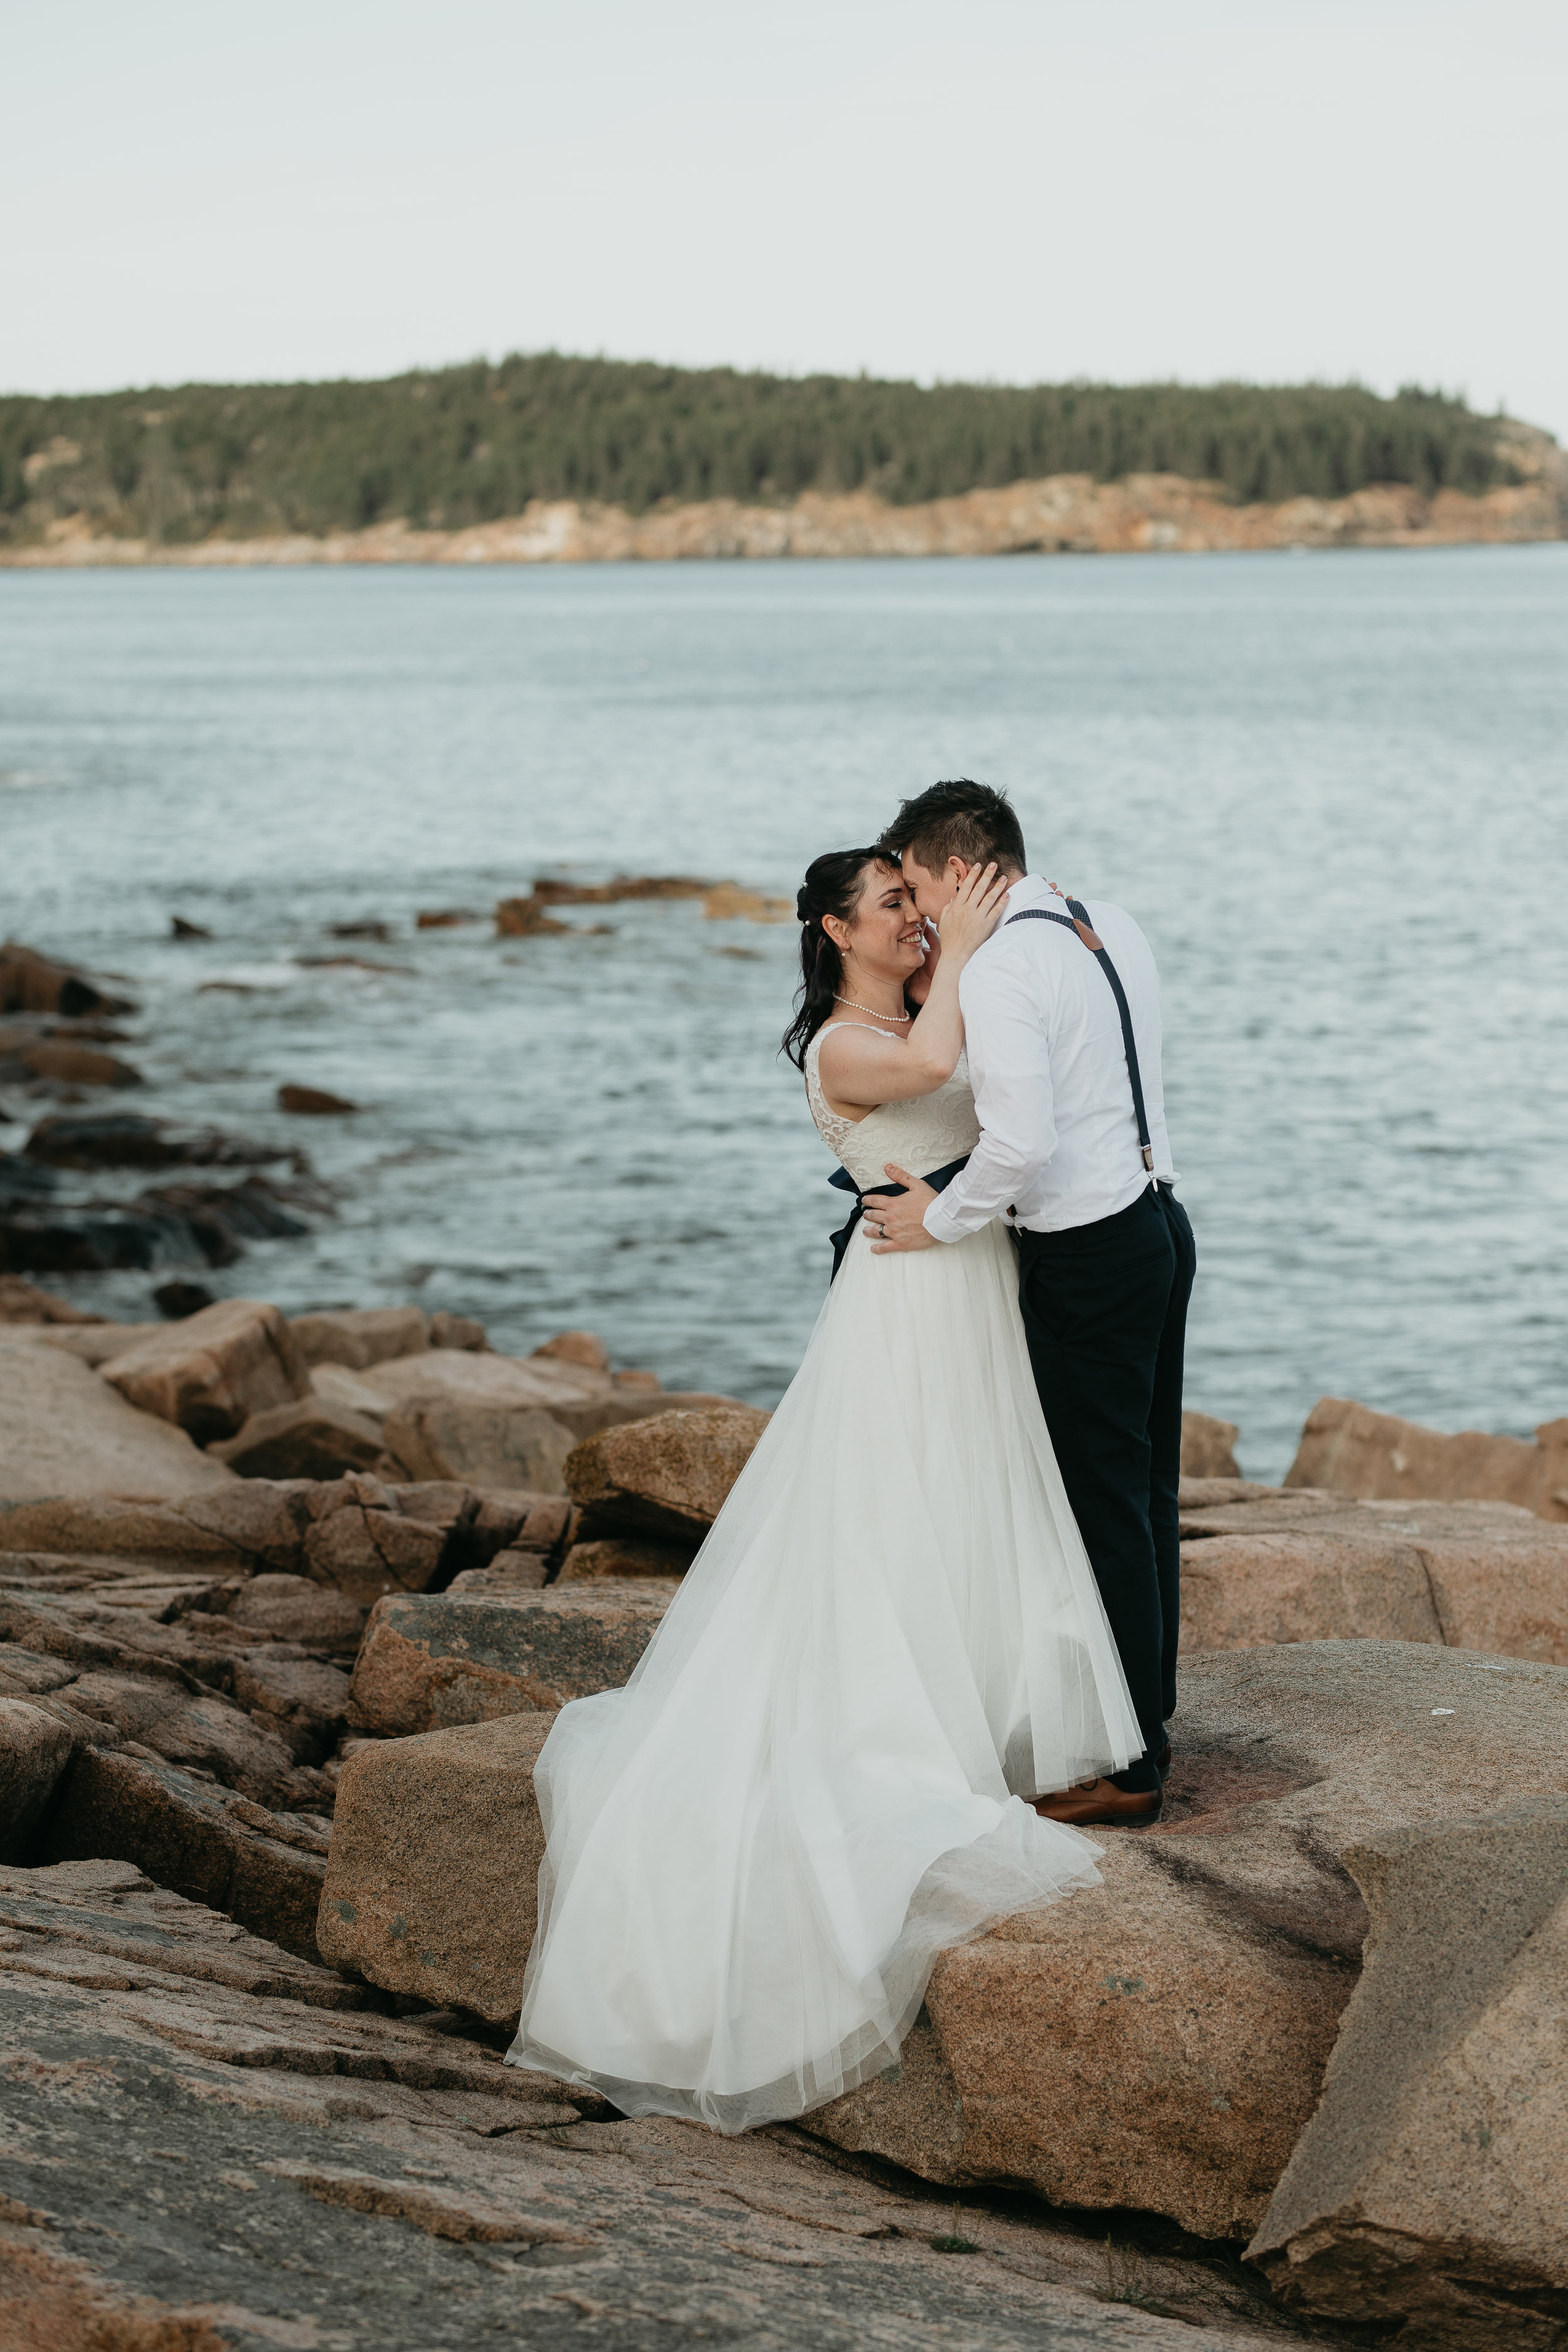 nicole-daacke-photography-Elopement-rocky-shoreline-coast-Acadia-National-Park-elopement-photographer-inspiration-maine-elopement-otter-cliffs-schoonic-head-point-49.jpg